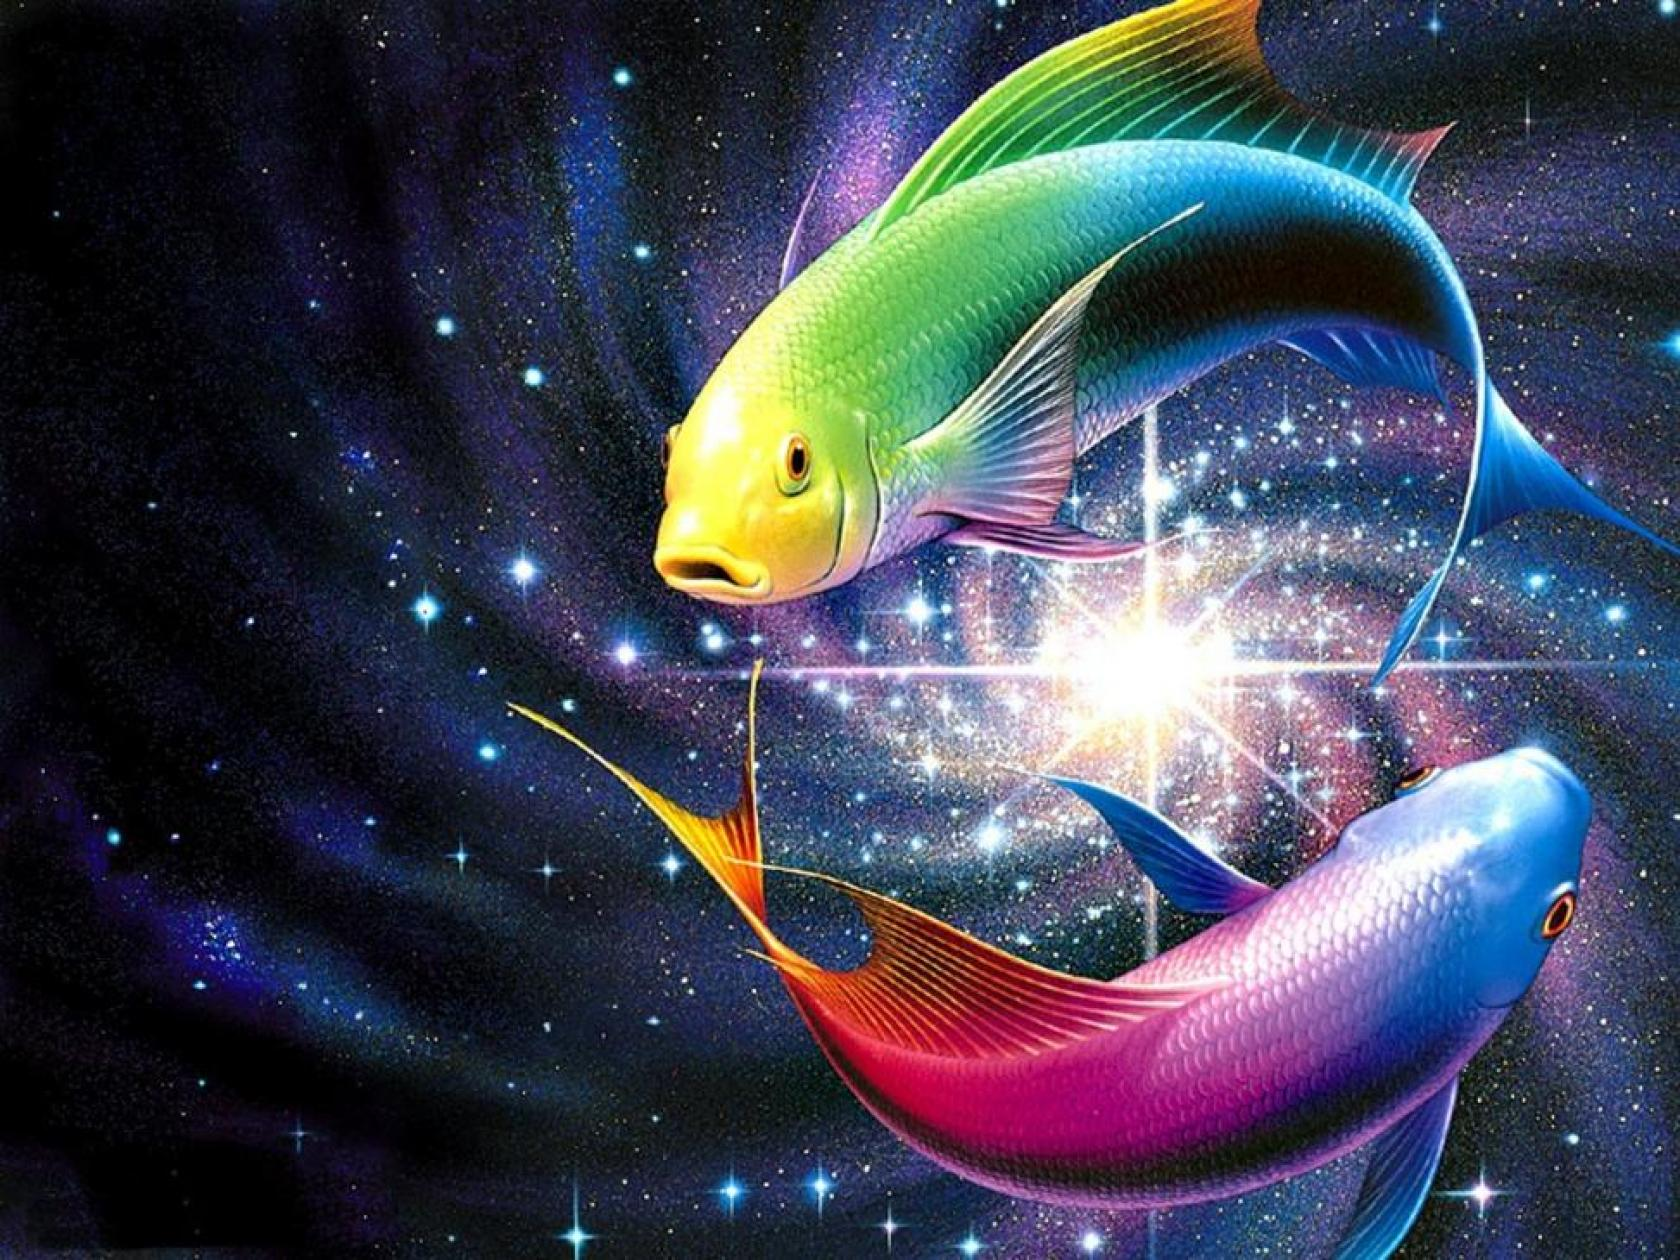 Fish Wallpaper: Mesmerizing Fish Wallpaper 1680x1260px